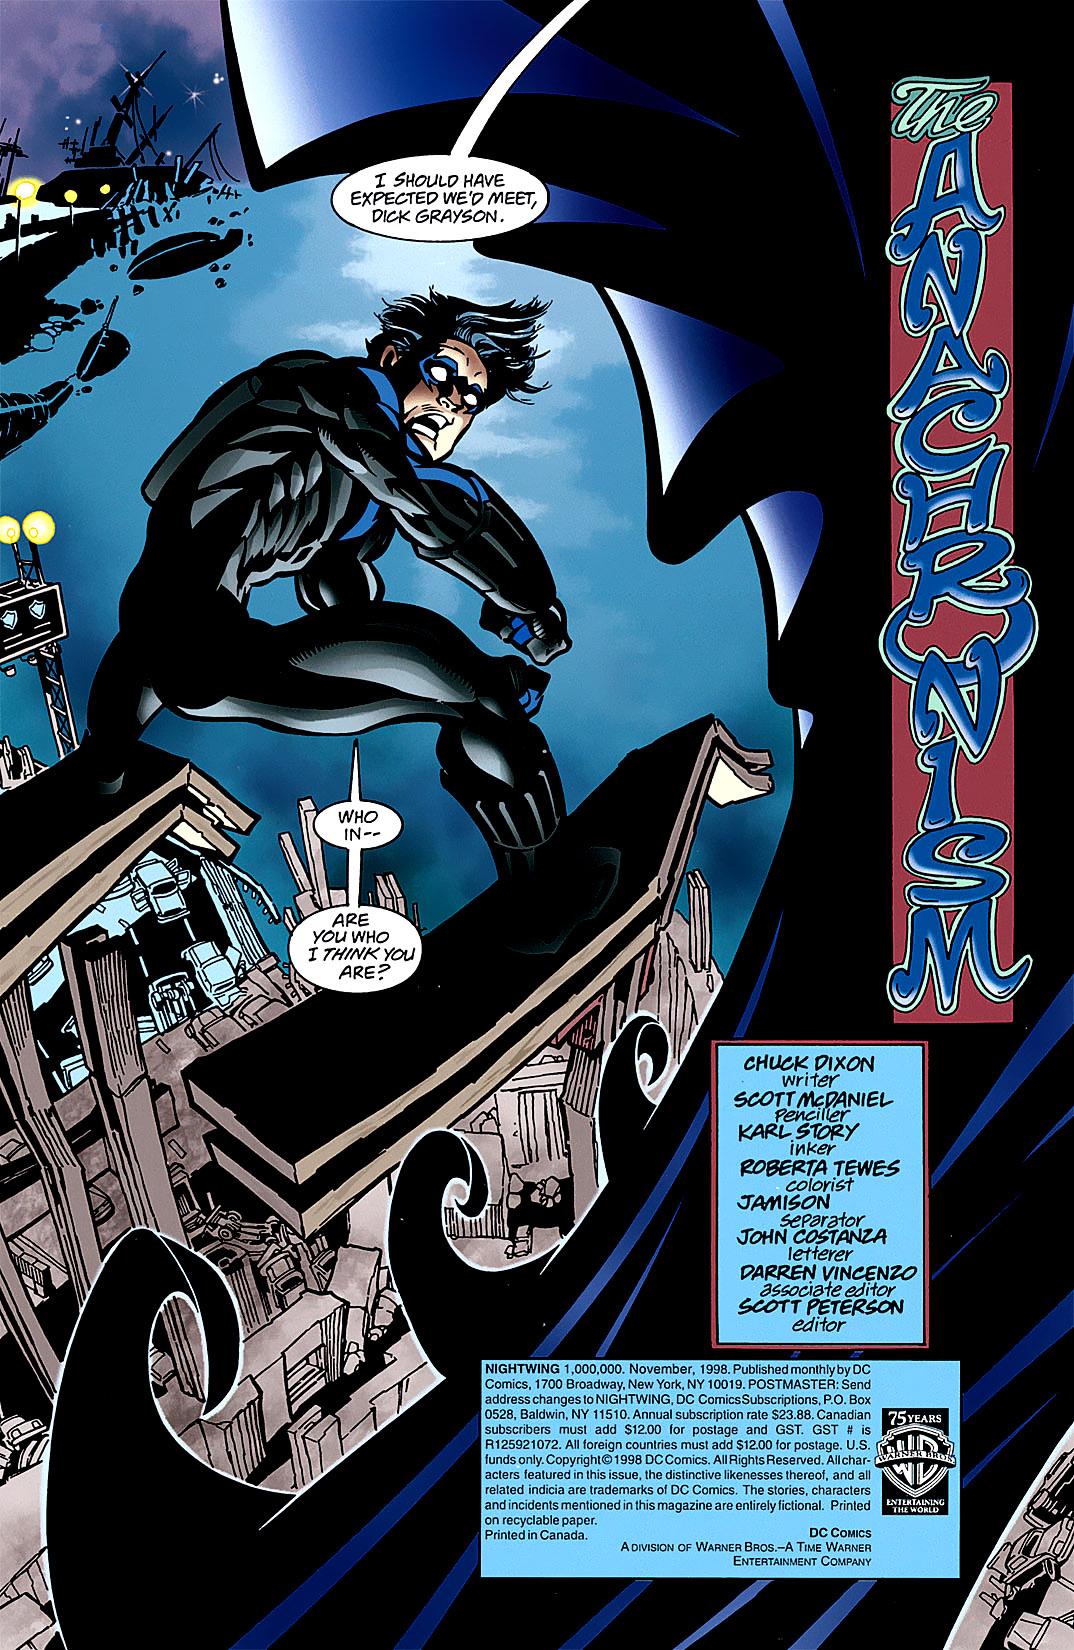 Nightwing (1996) chap 1000000 pic 3